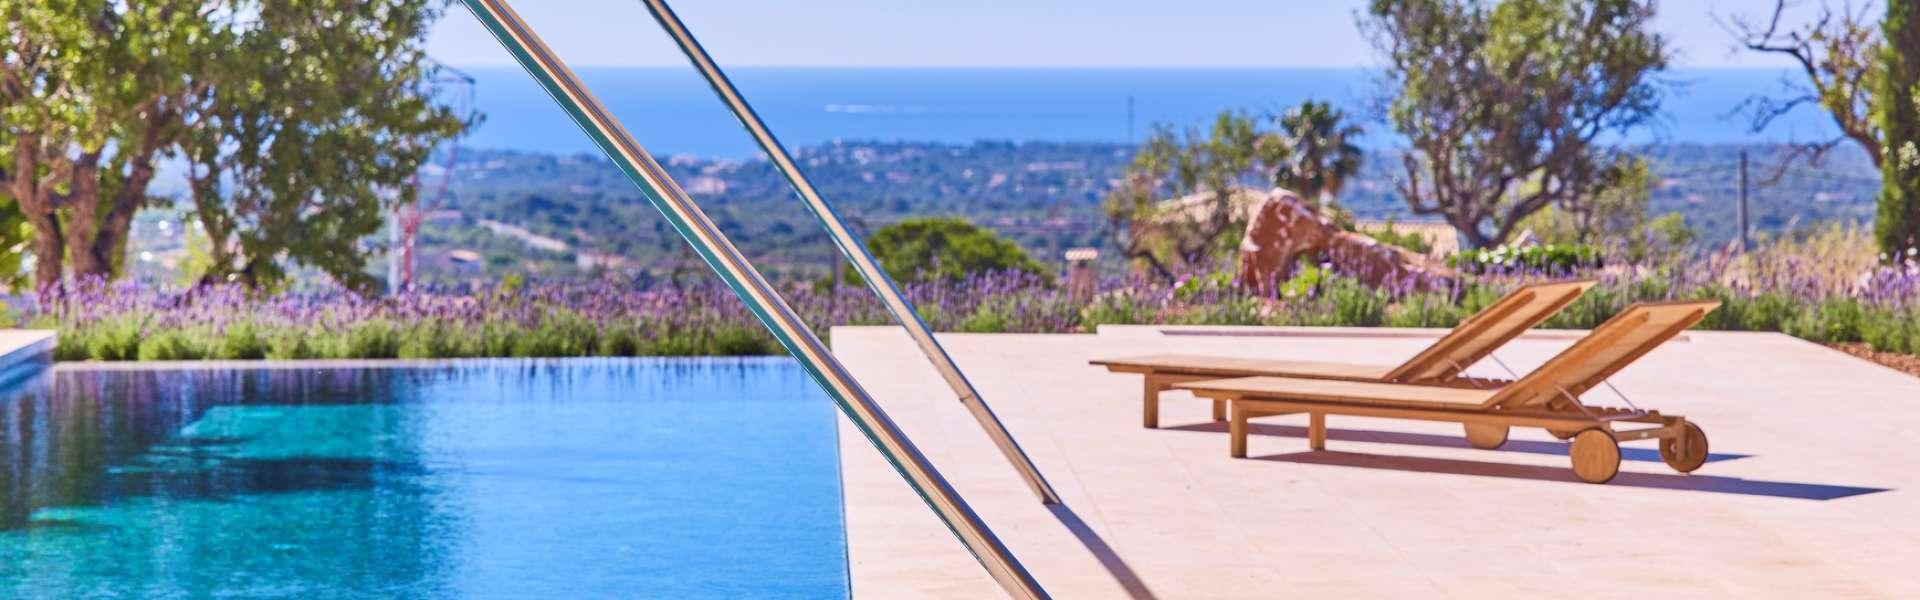 Montemar S.L. - Mallorca Bauprojekte mit Meerblick